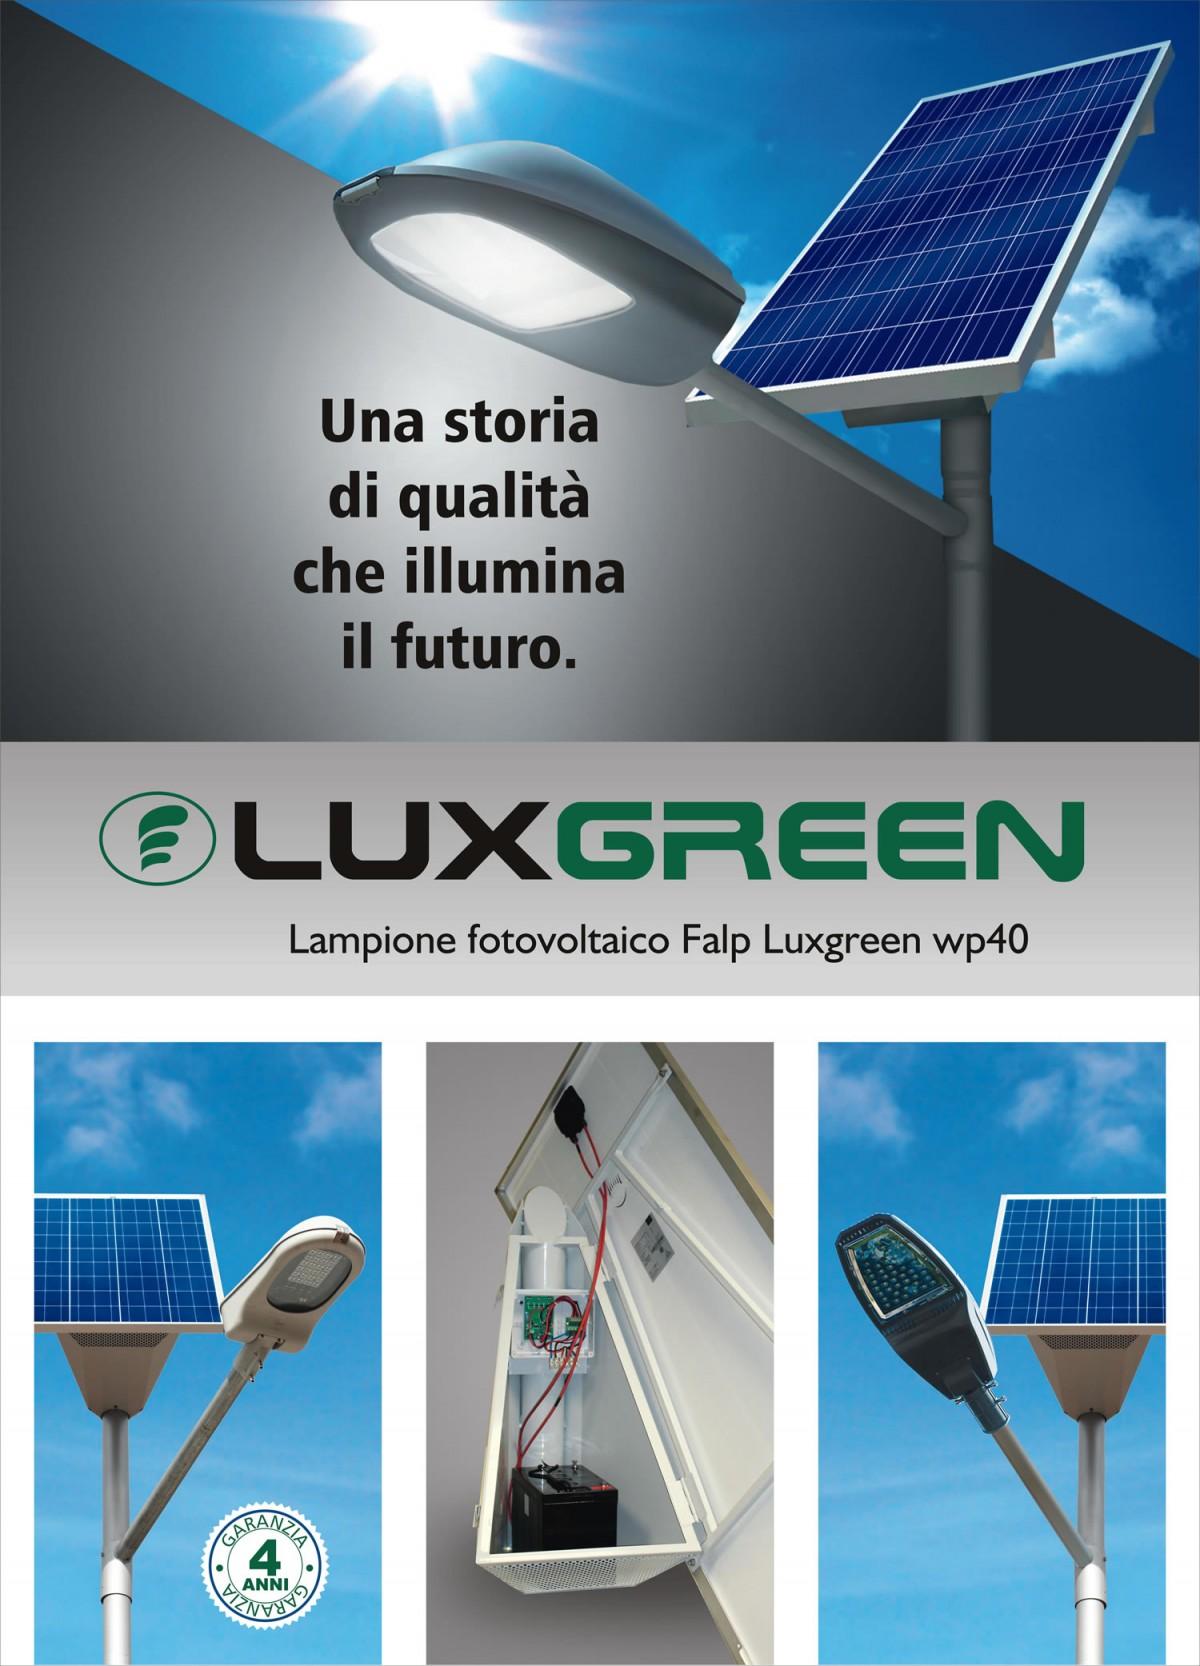 LuxGreen Falp